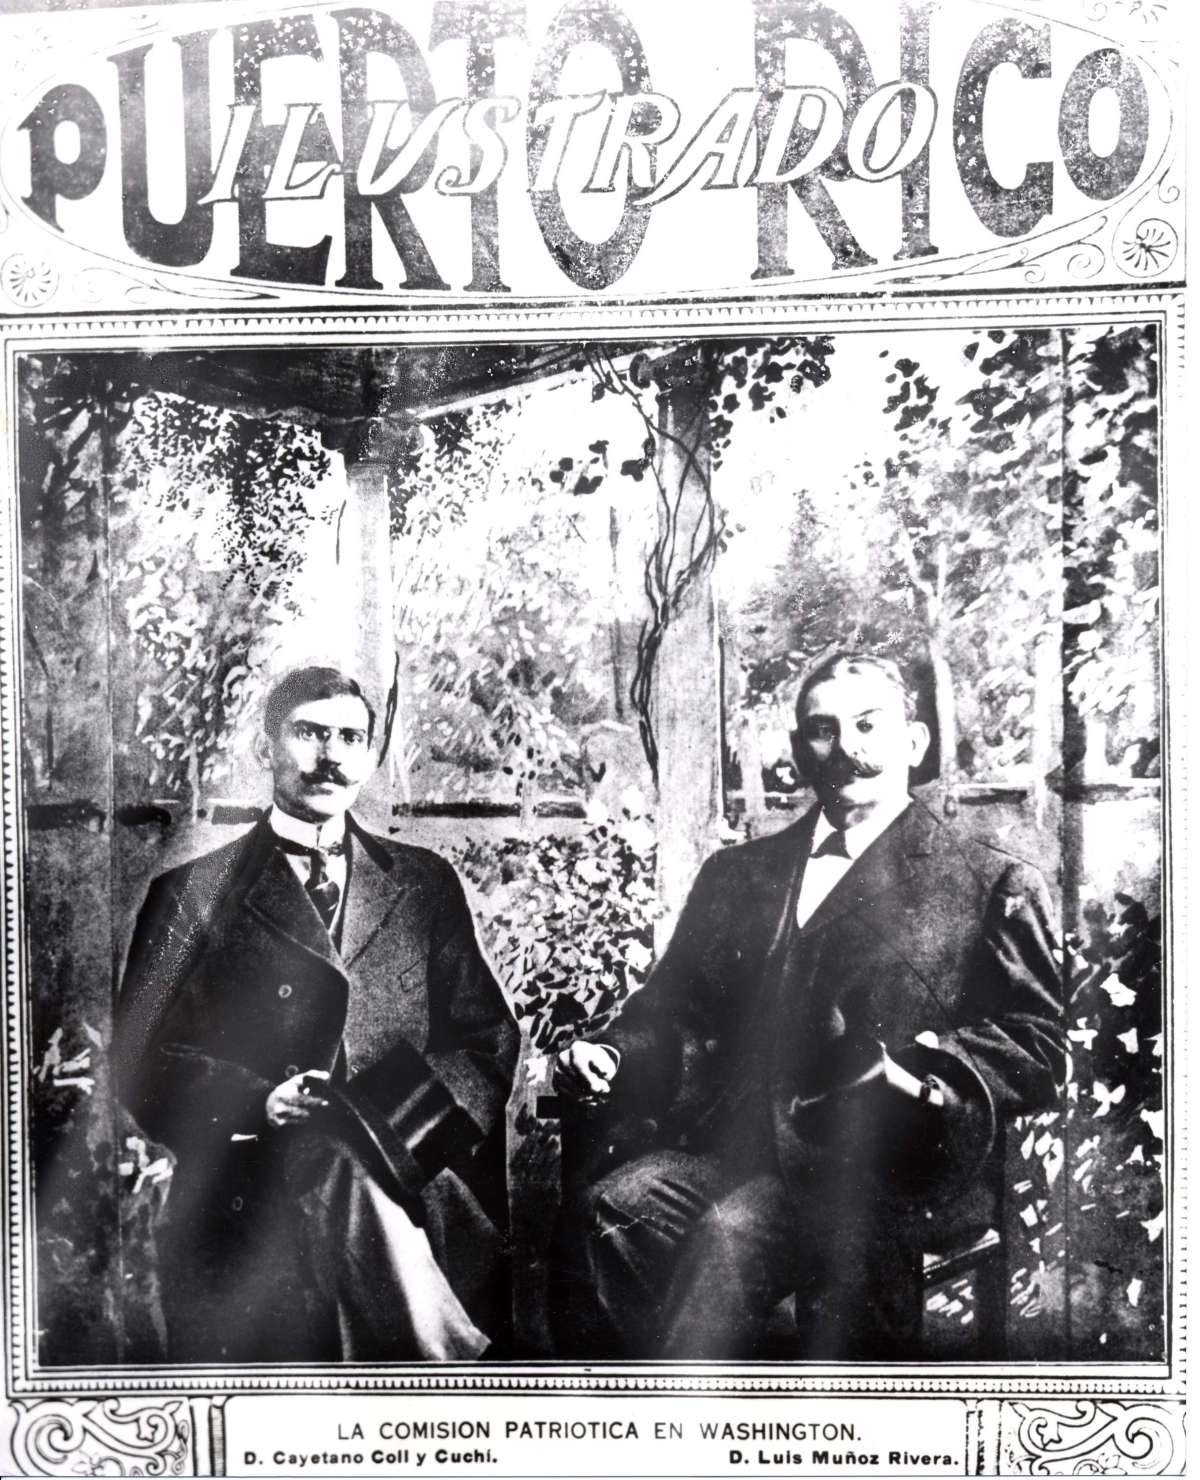 Luis Muñoz Rivera